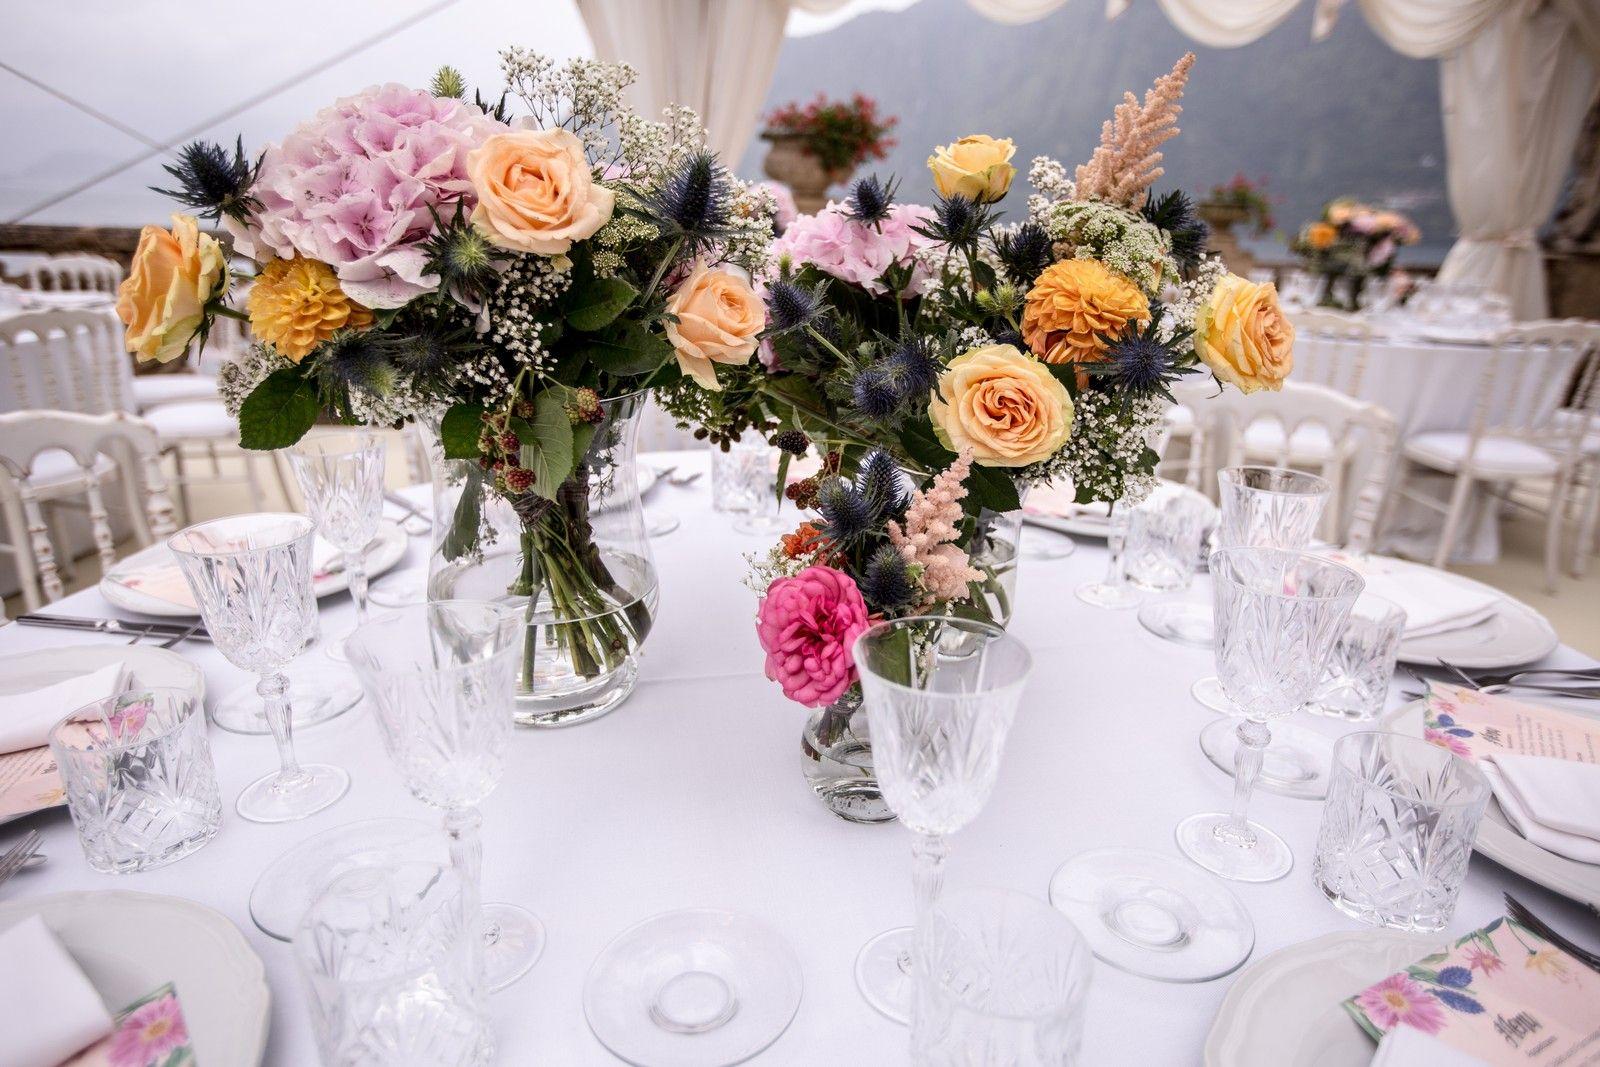 Table villa balbianello